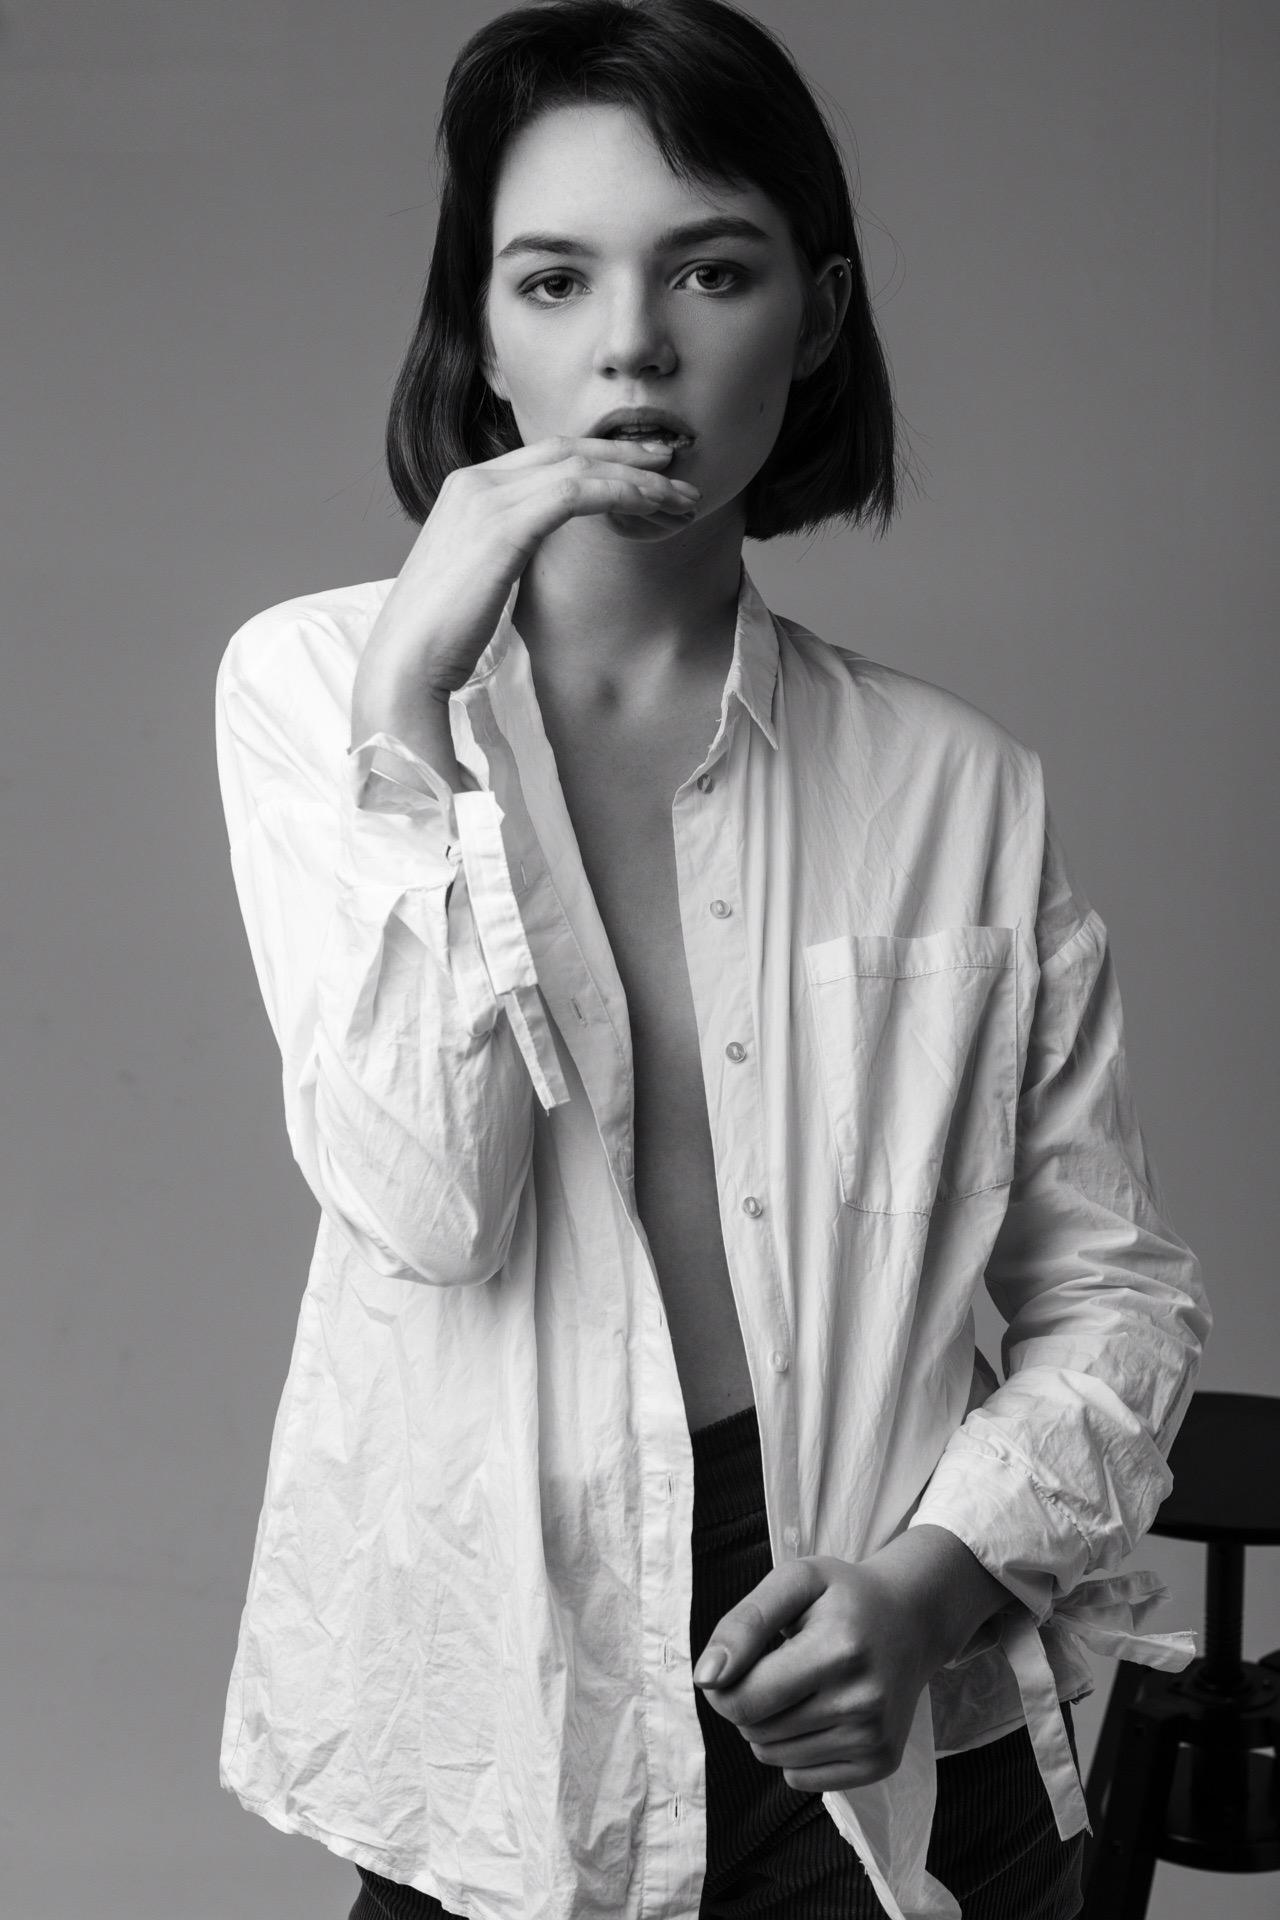 Viktoria by Yura Ionov